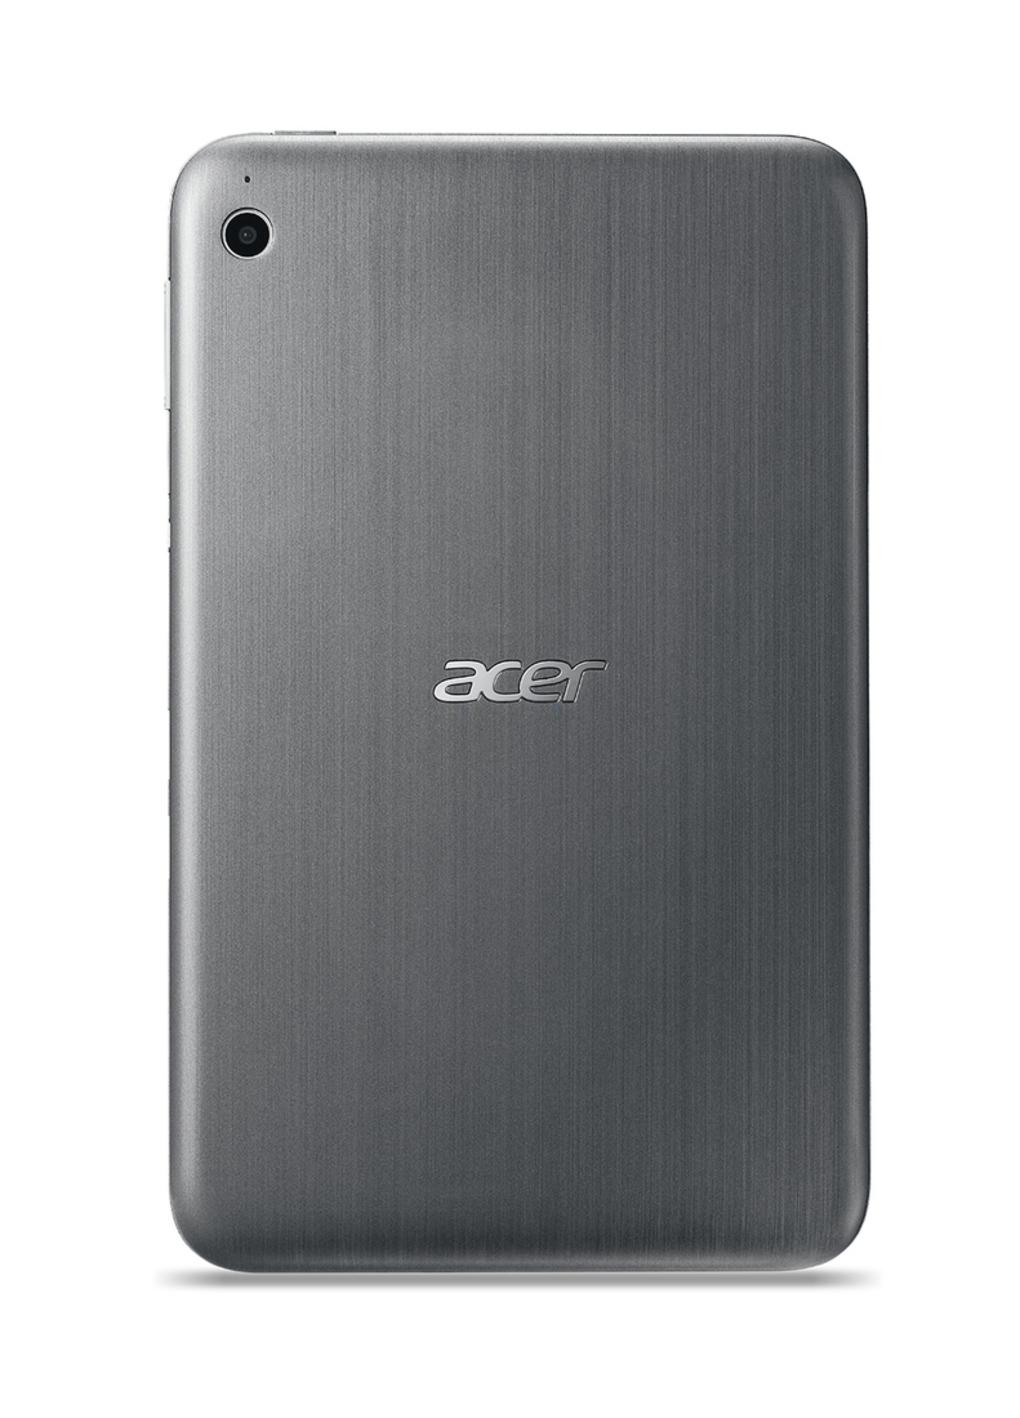 Foto de Acer Iconia W4 (1/7)